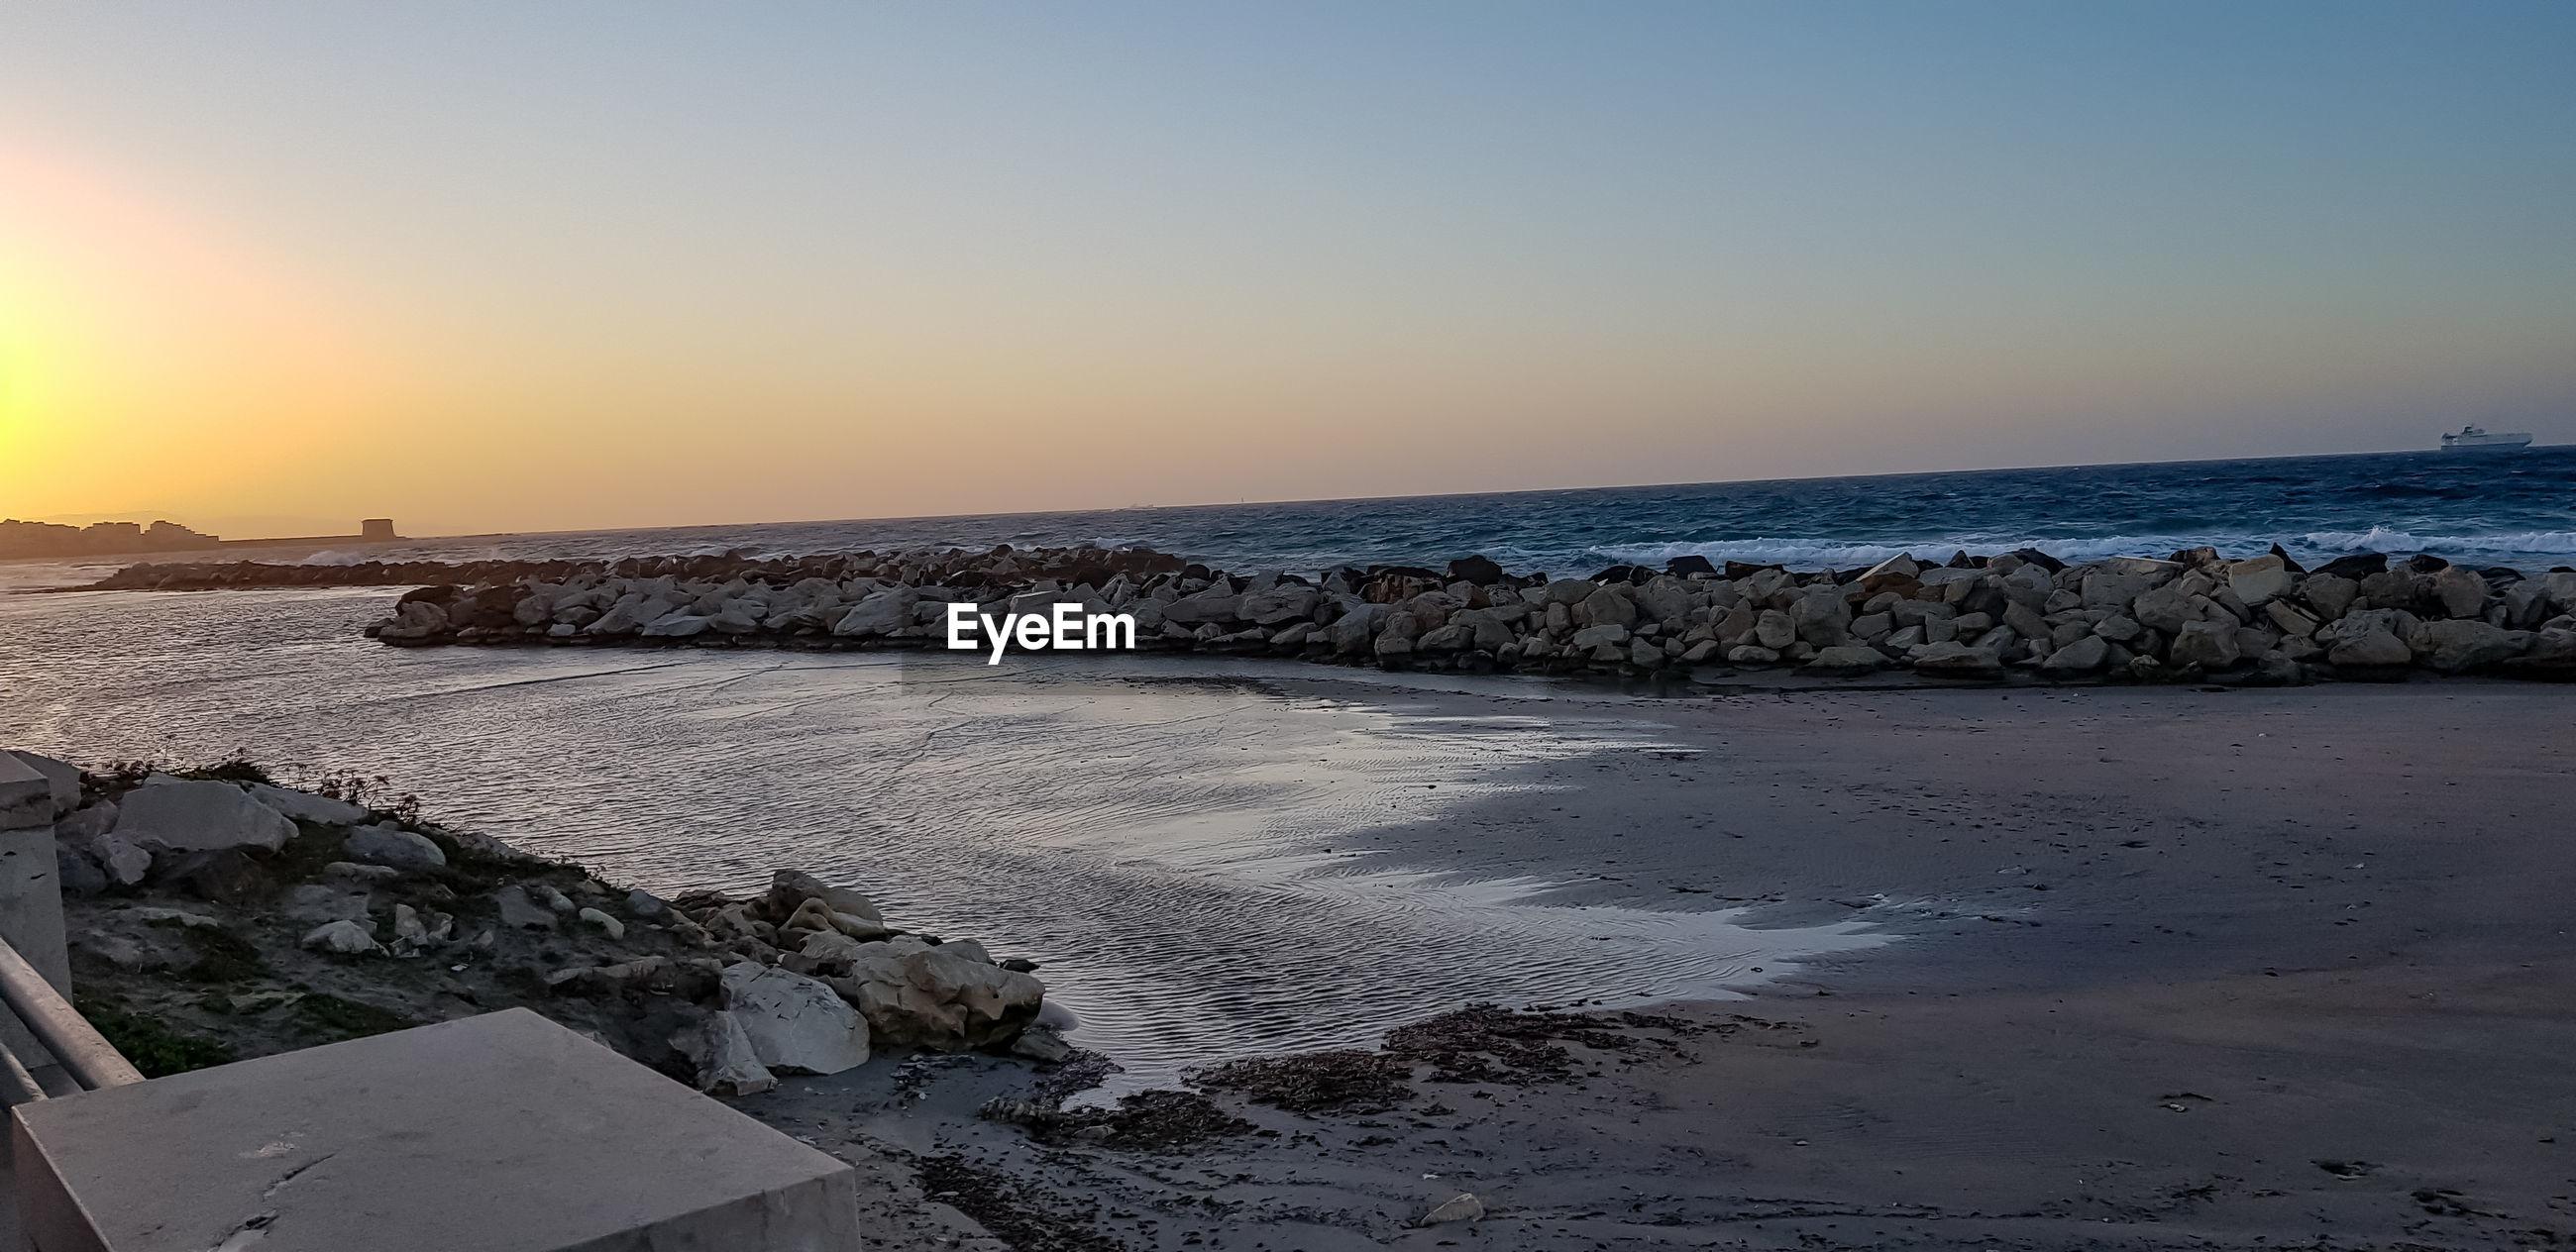 Horizon on the sea